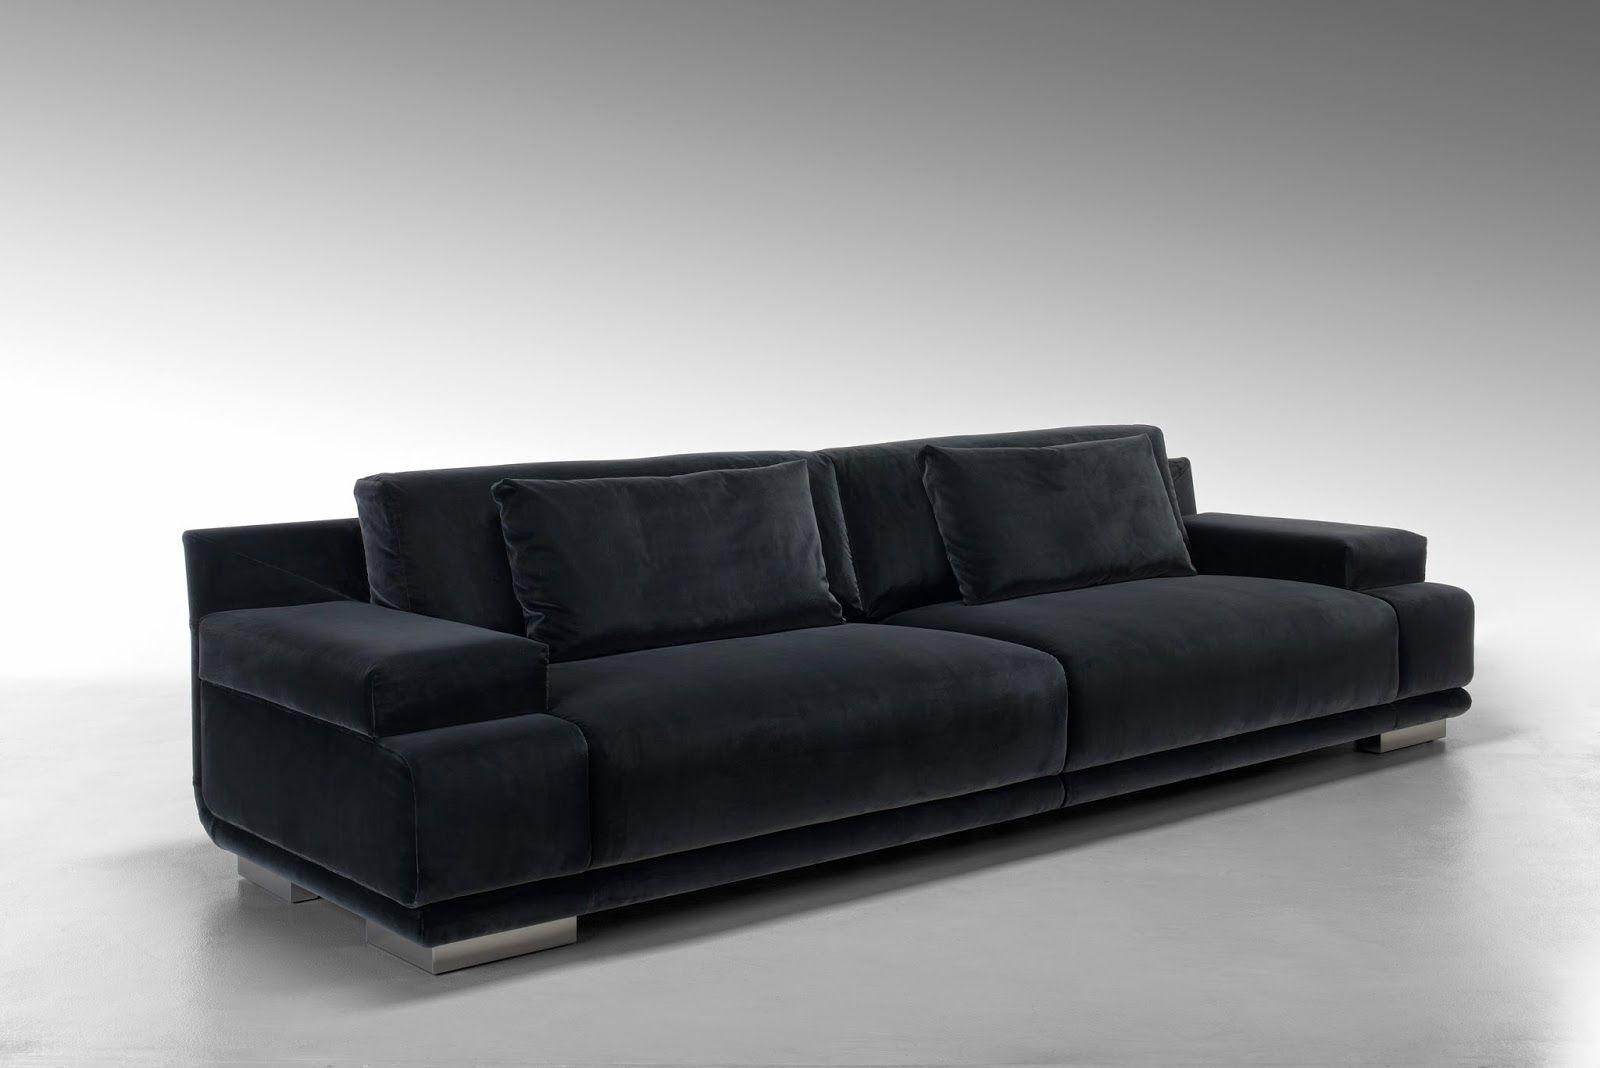 Fendi casa artu sofa designed by thierry lemaire google for Fenda muebles